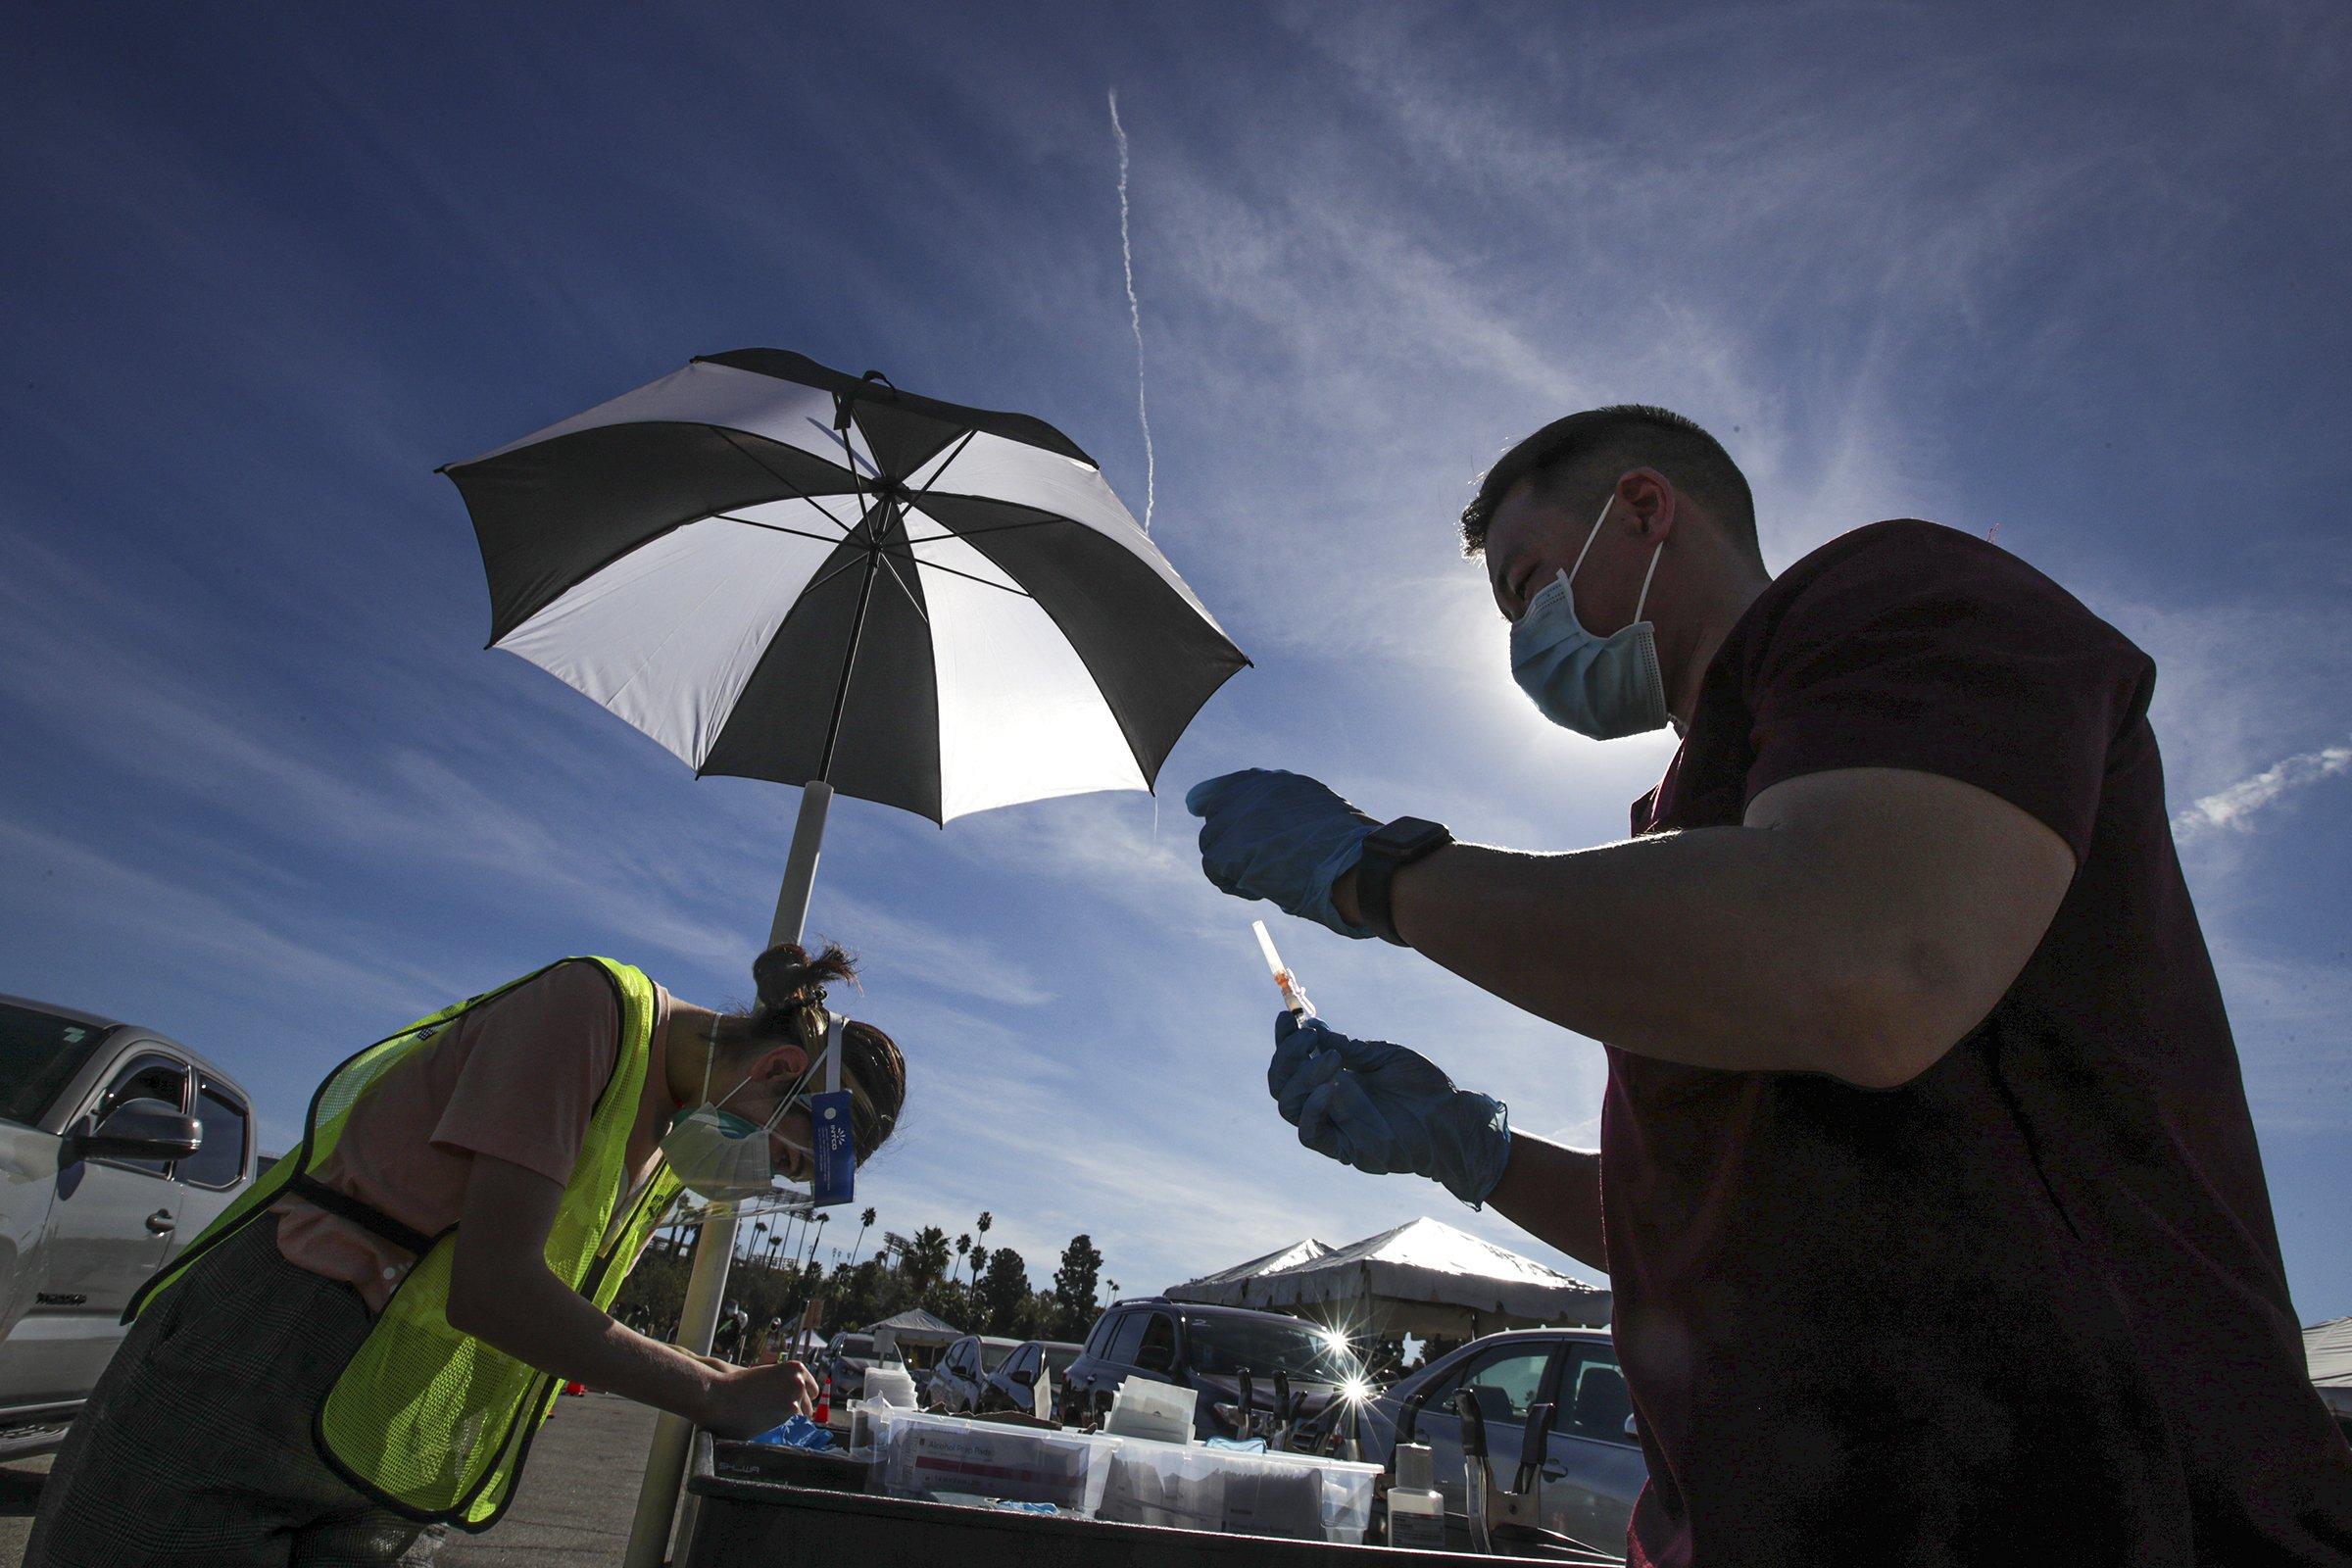 apnews.com: The Latest: Wisconsin gov blasts empty federal vaccine vow